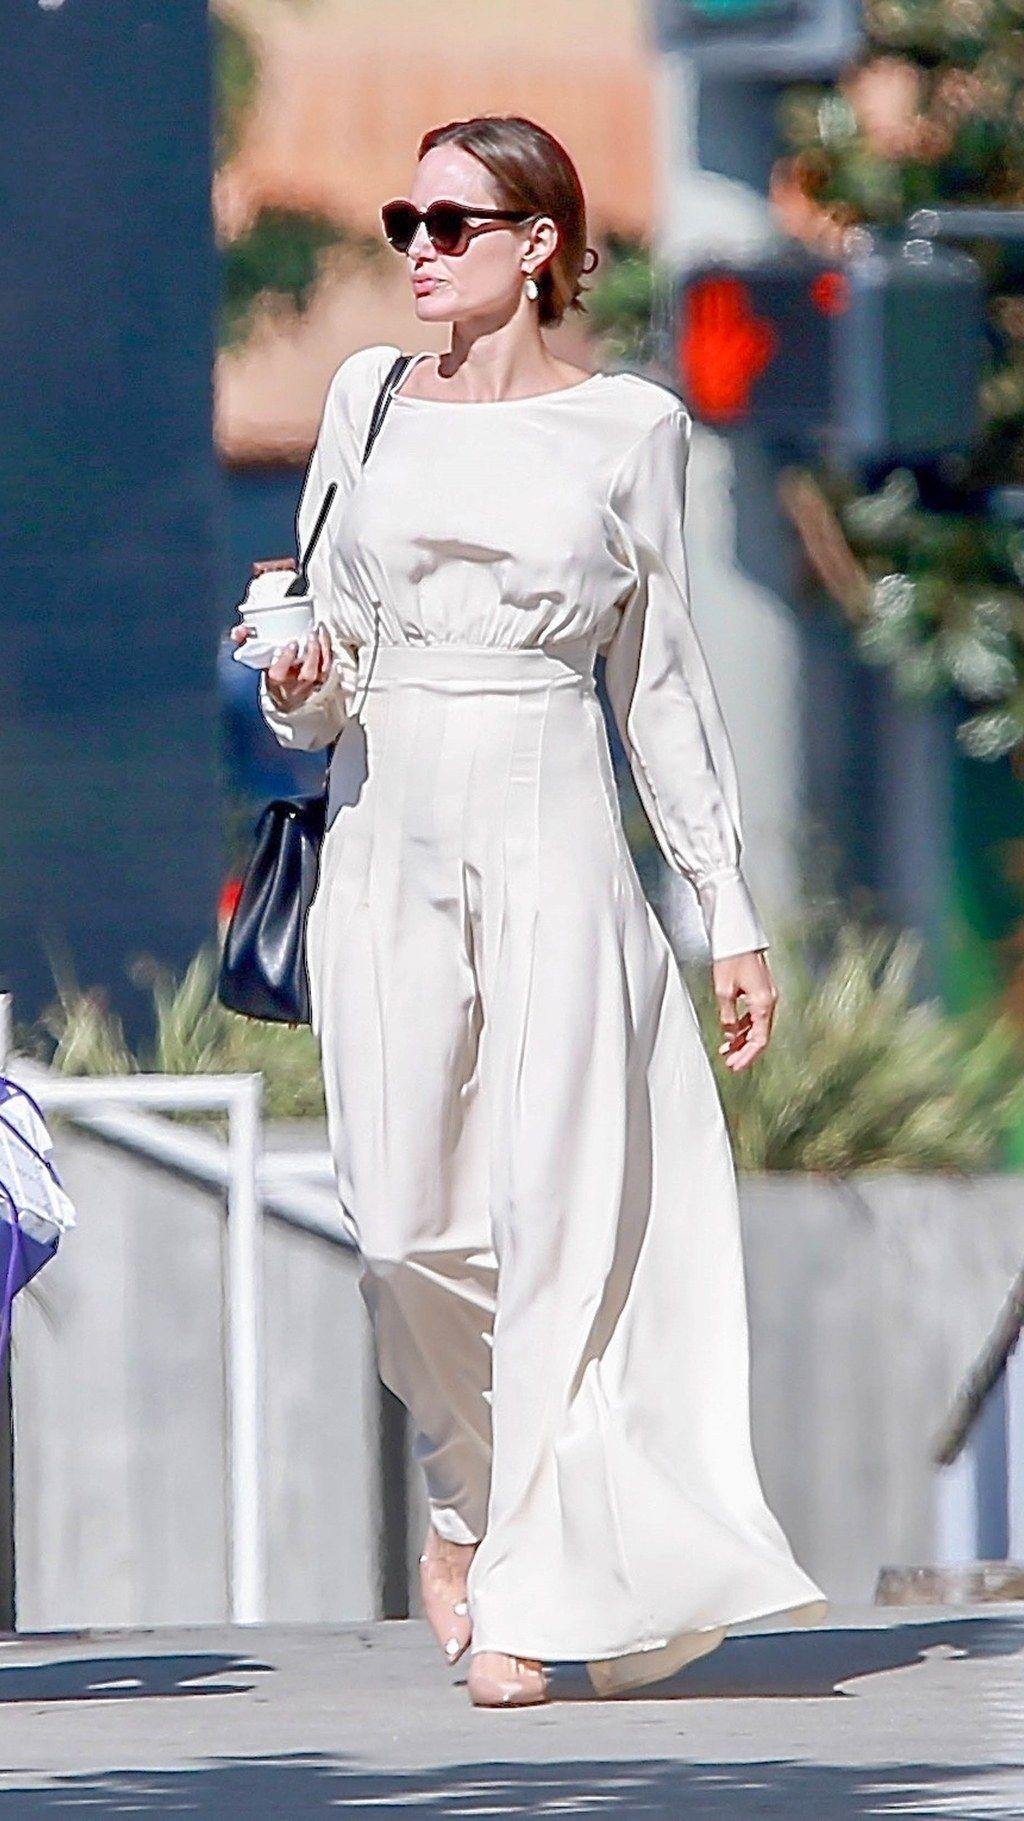 Angelina Jolie Makes Her Sunday Maxi Dress Look Red Carpet Worthy Angelina Jolie Dress Angelina Jolie Style Celebrity Street Style [ 1821 x 1024 Pixel ]